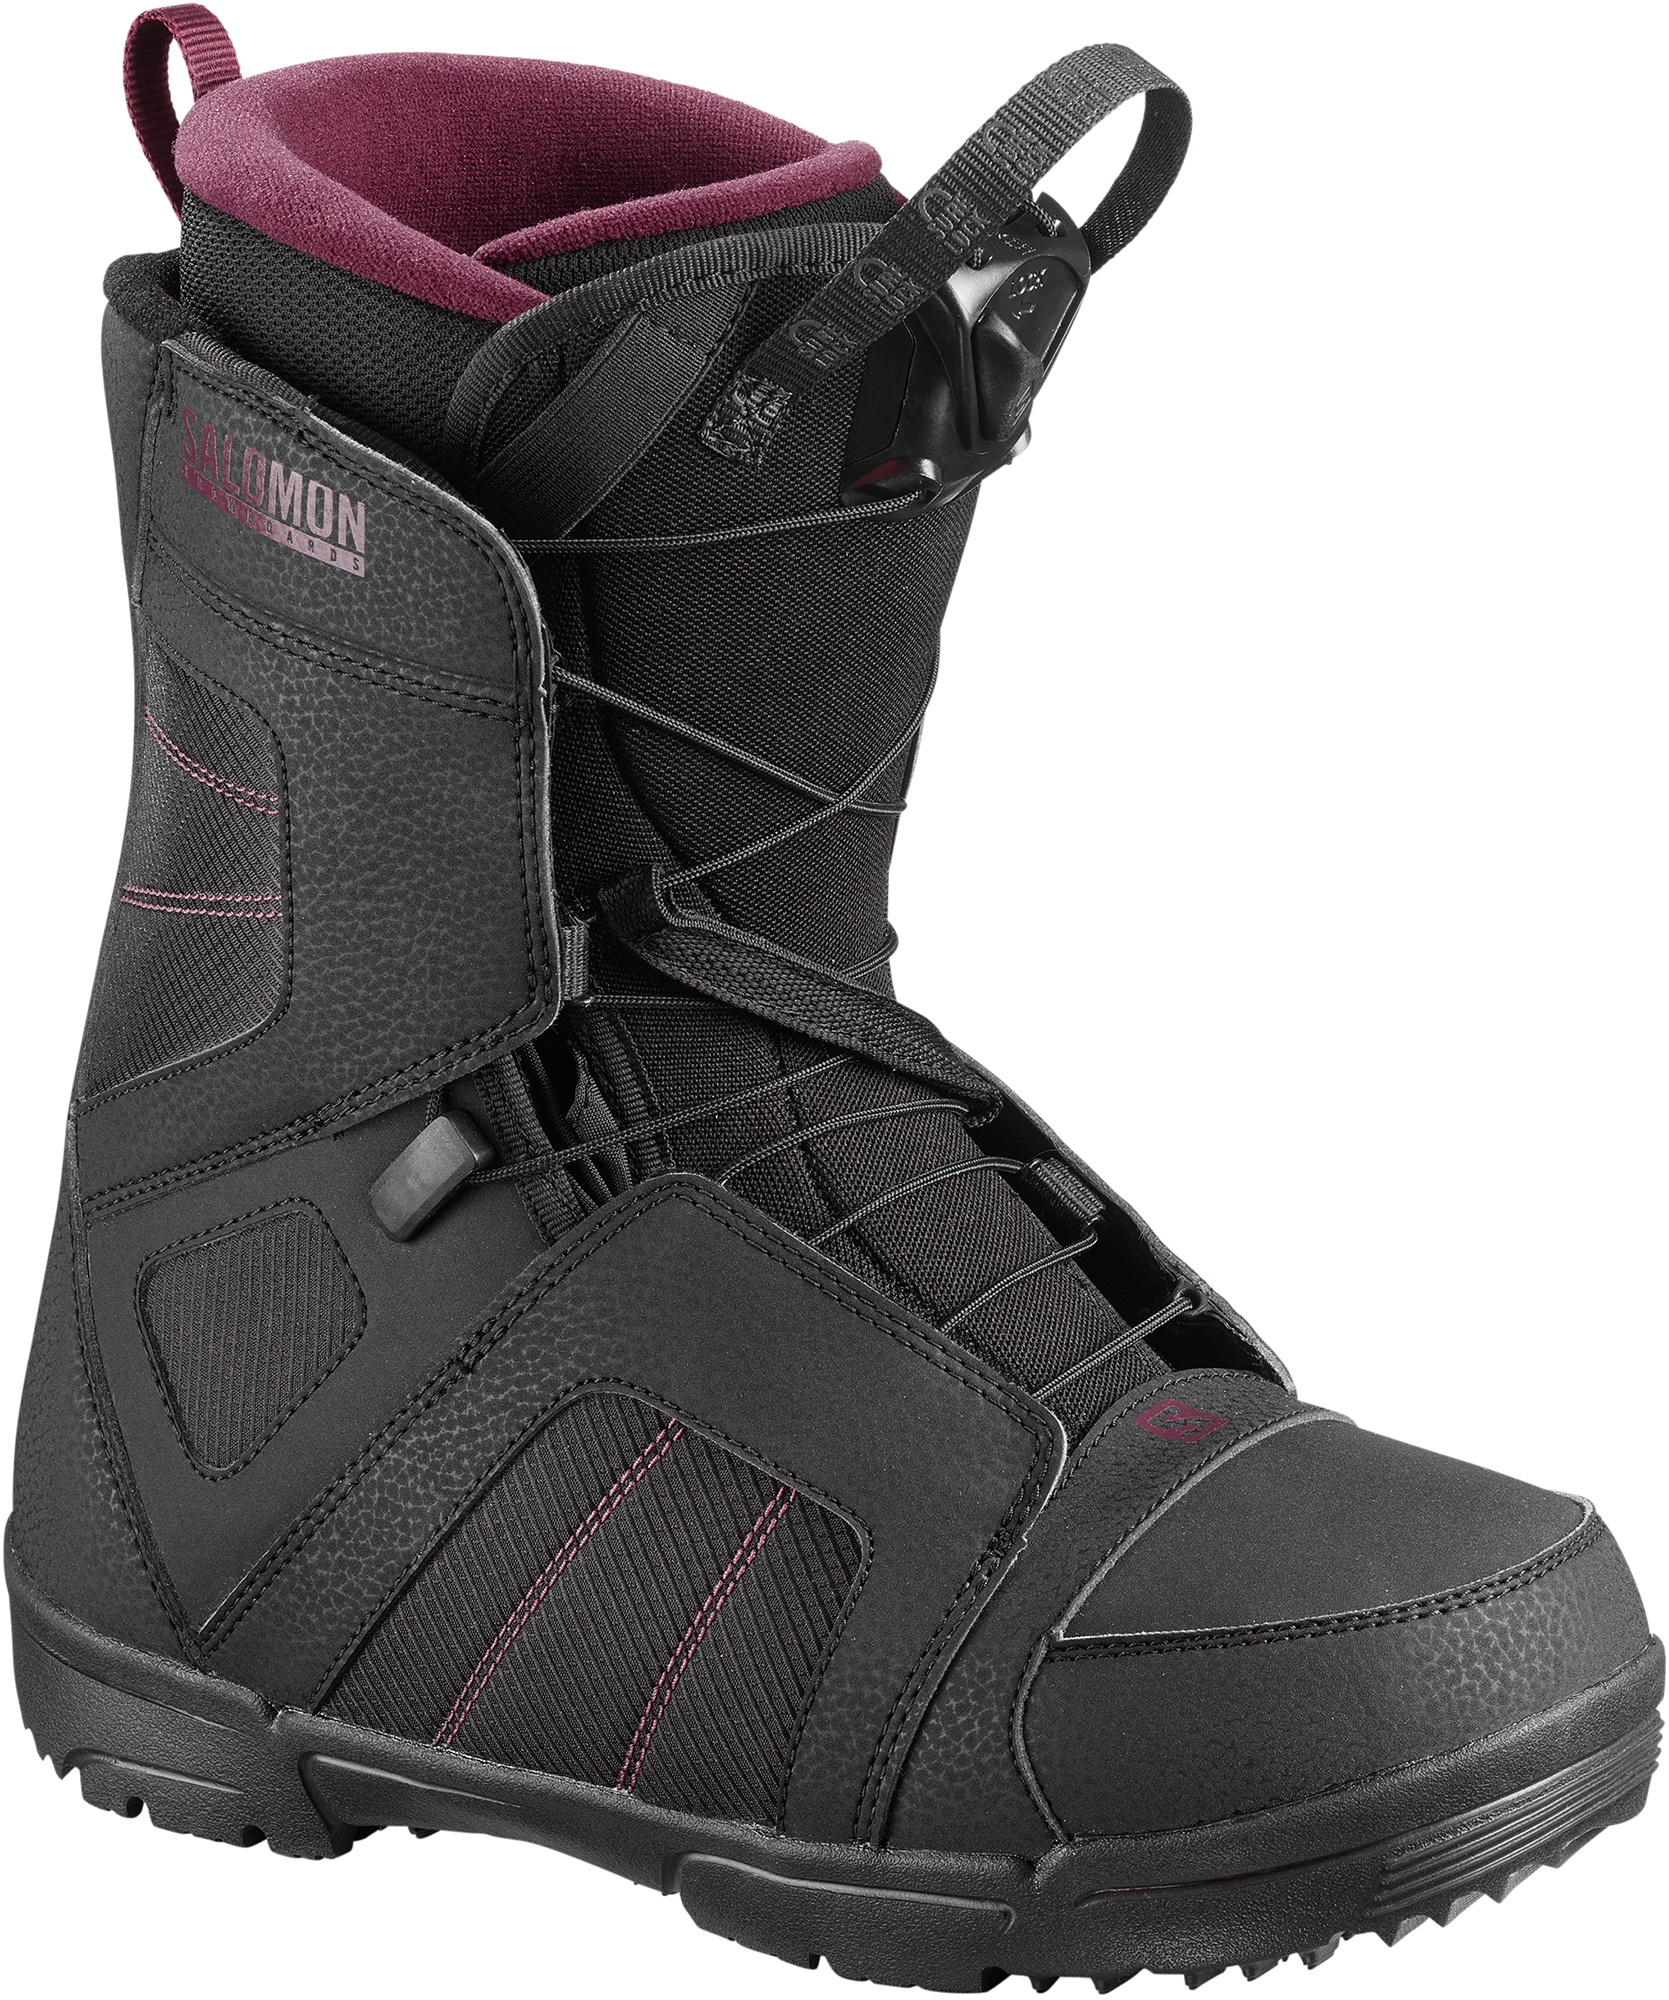 Salomon Сноубордические ботинки женские Salomon Scarlet, размер 36,5 salomon ботинки горнолыжные salomon x pro 110 размер 44